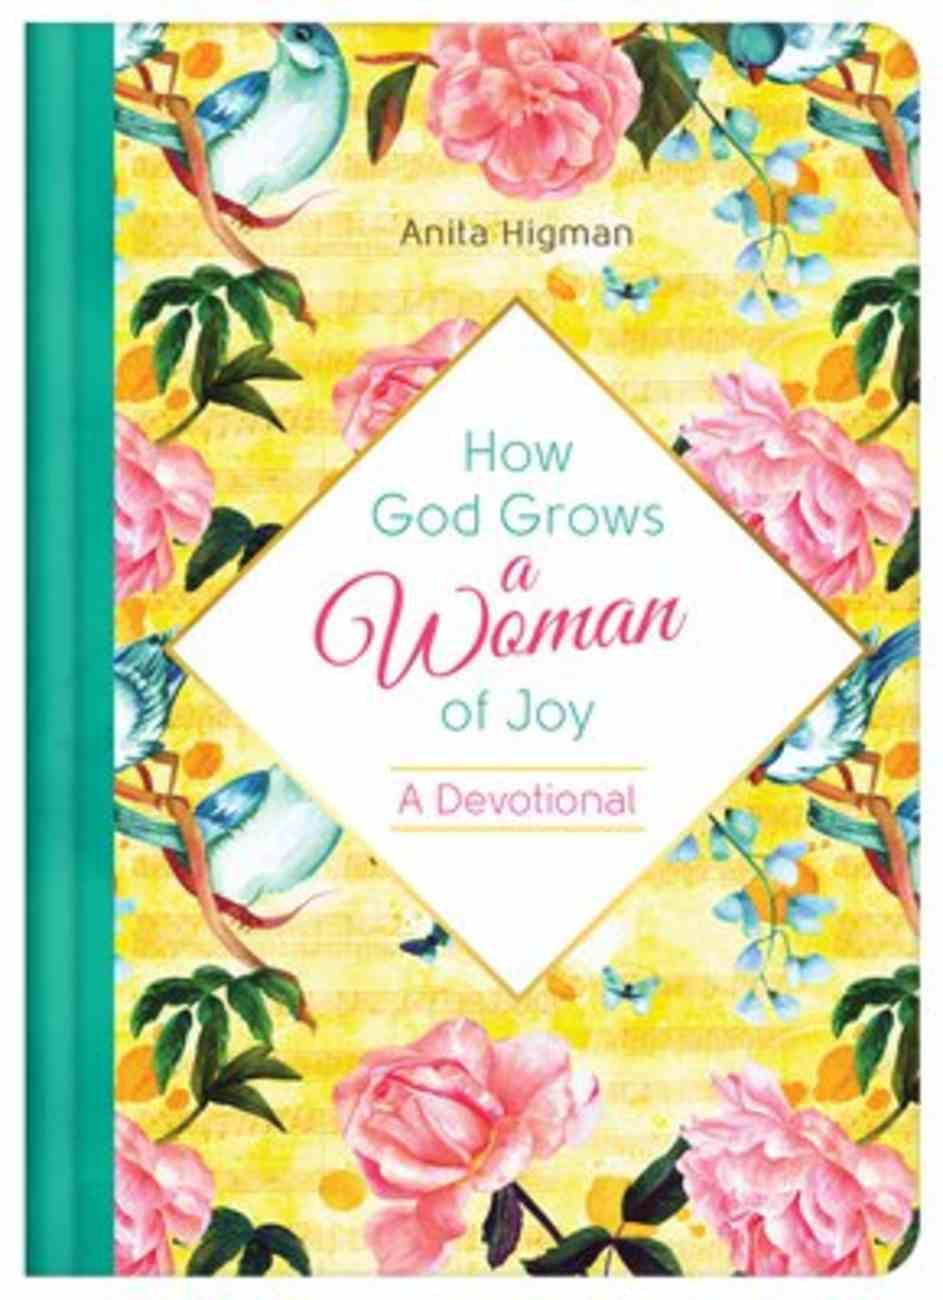 How God Grows a Woman of Joy: A Devotional Hardback